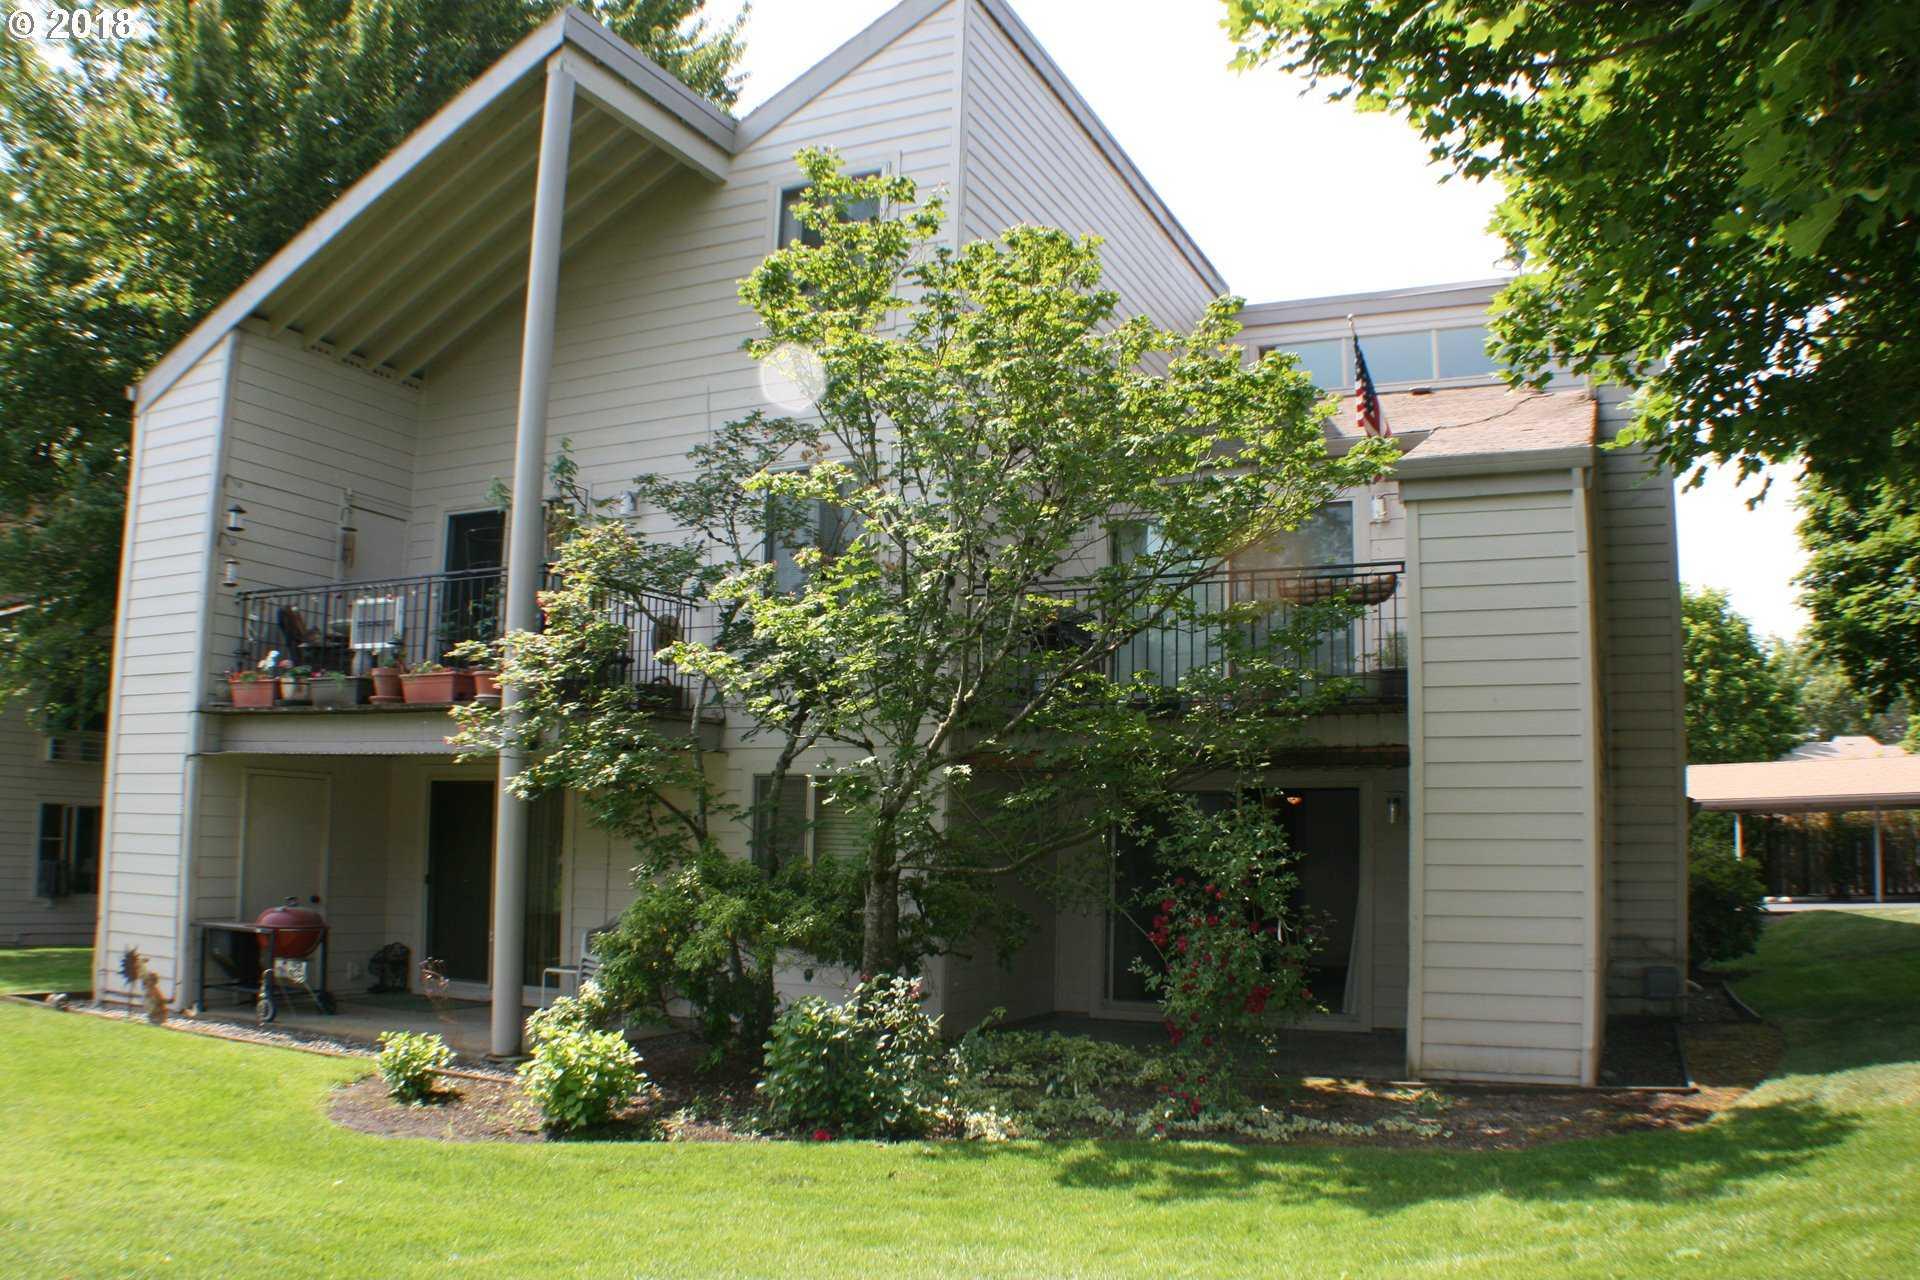 $185,000 - 2Br/2Ba -  for Sale in Beaverton